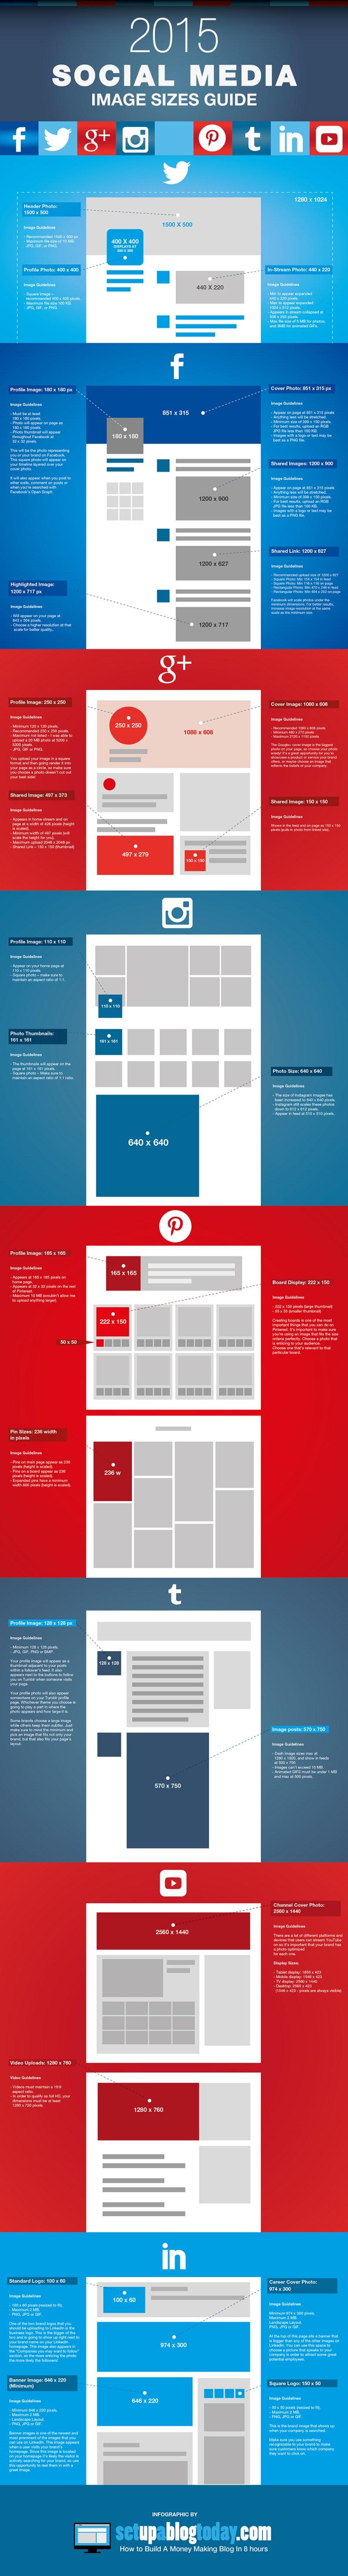 2015 Social Media Image Size Guide